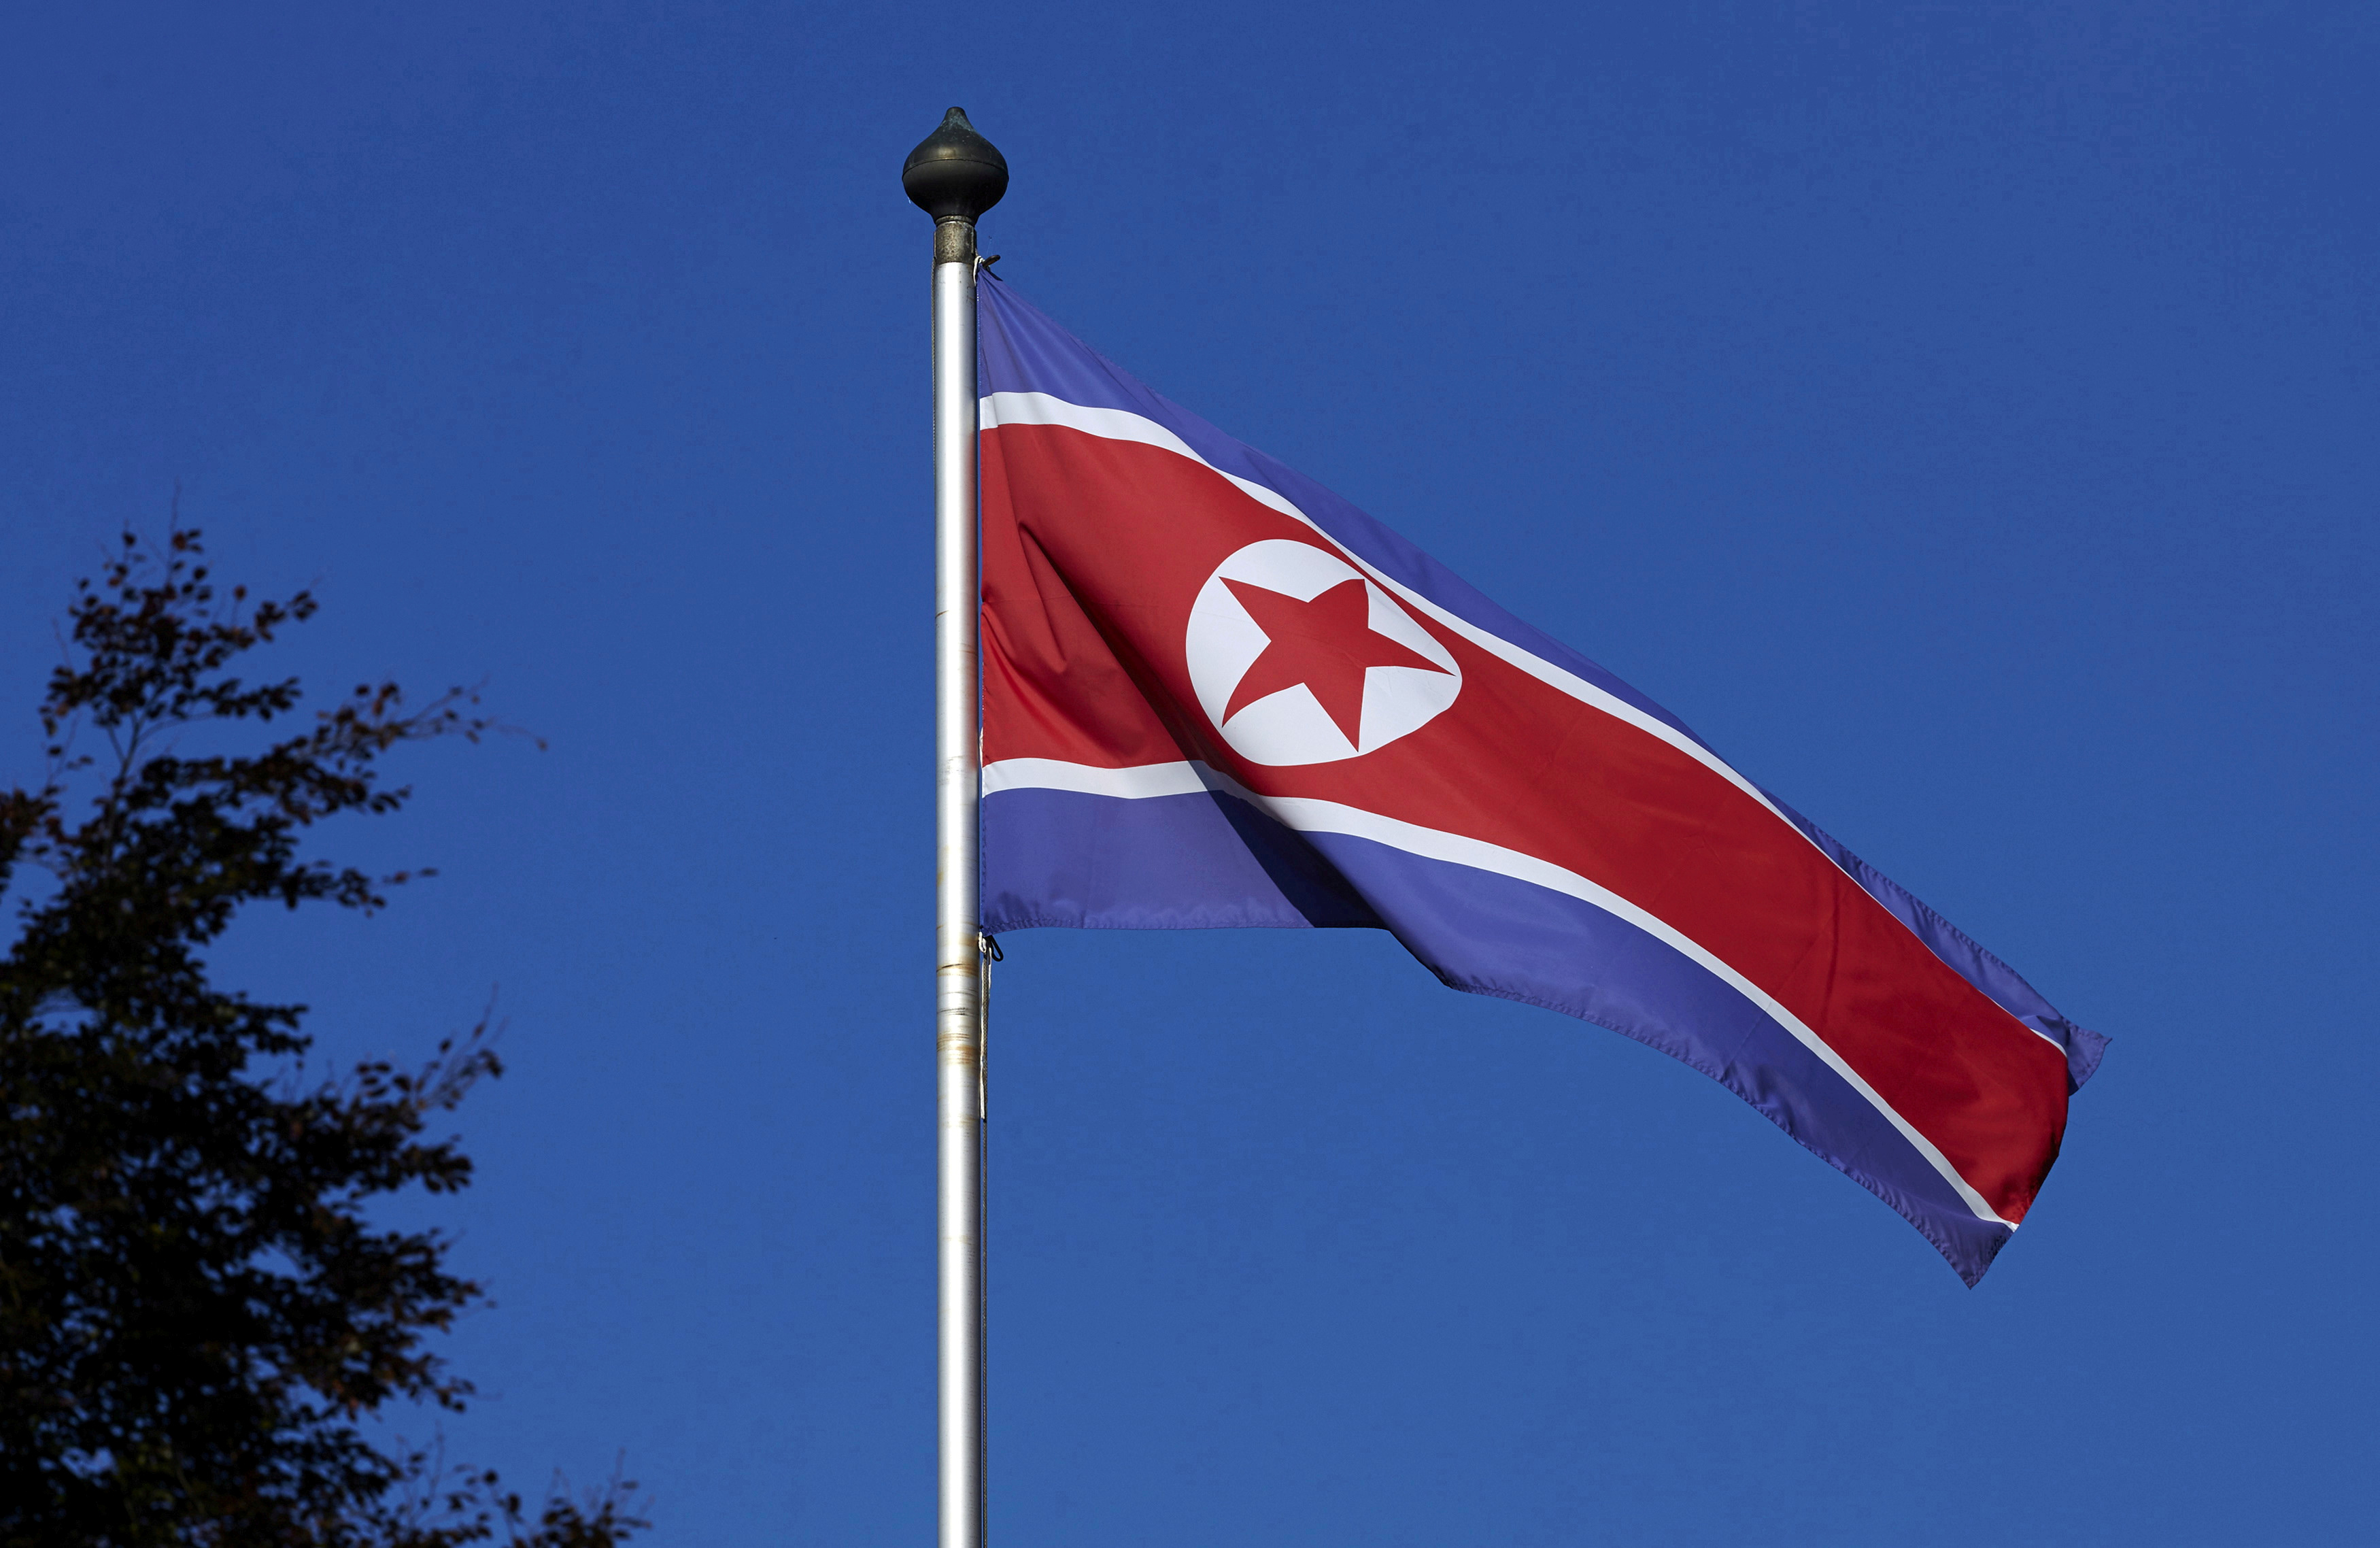 North Korea warns of retaliation against U.S-South Korea military drills